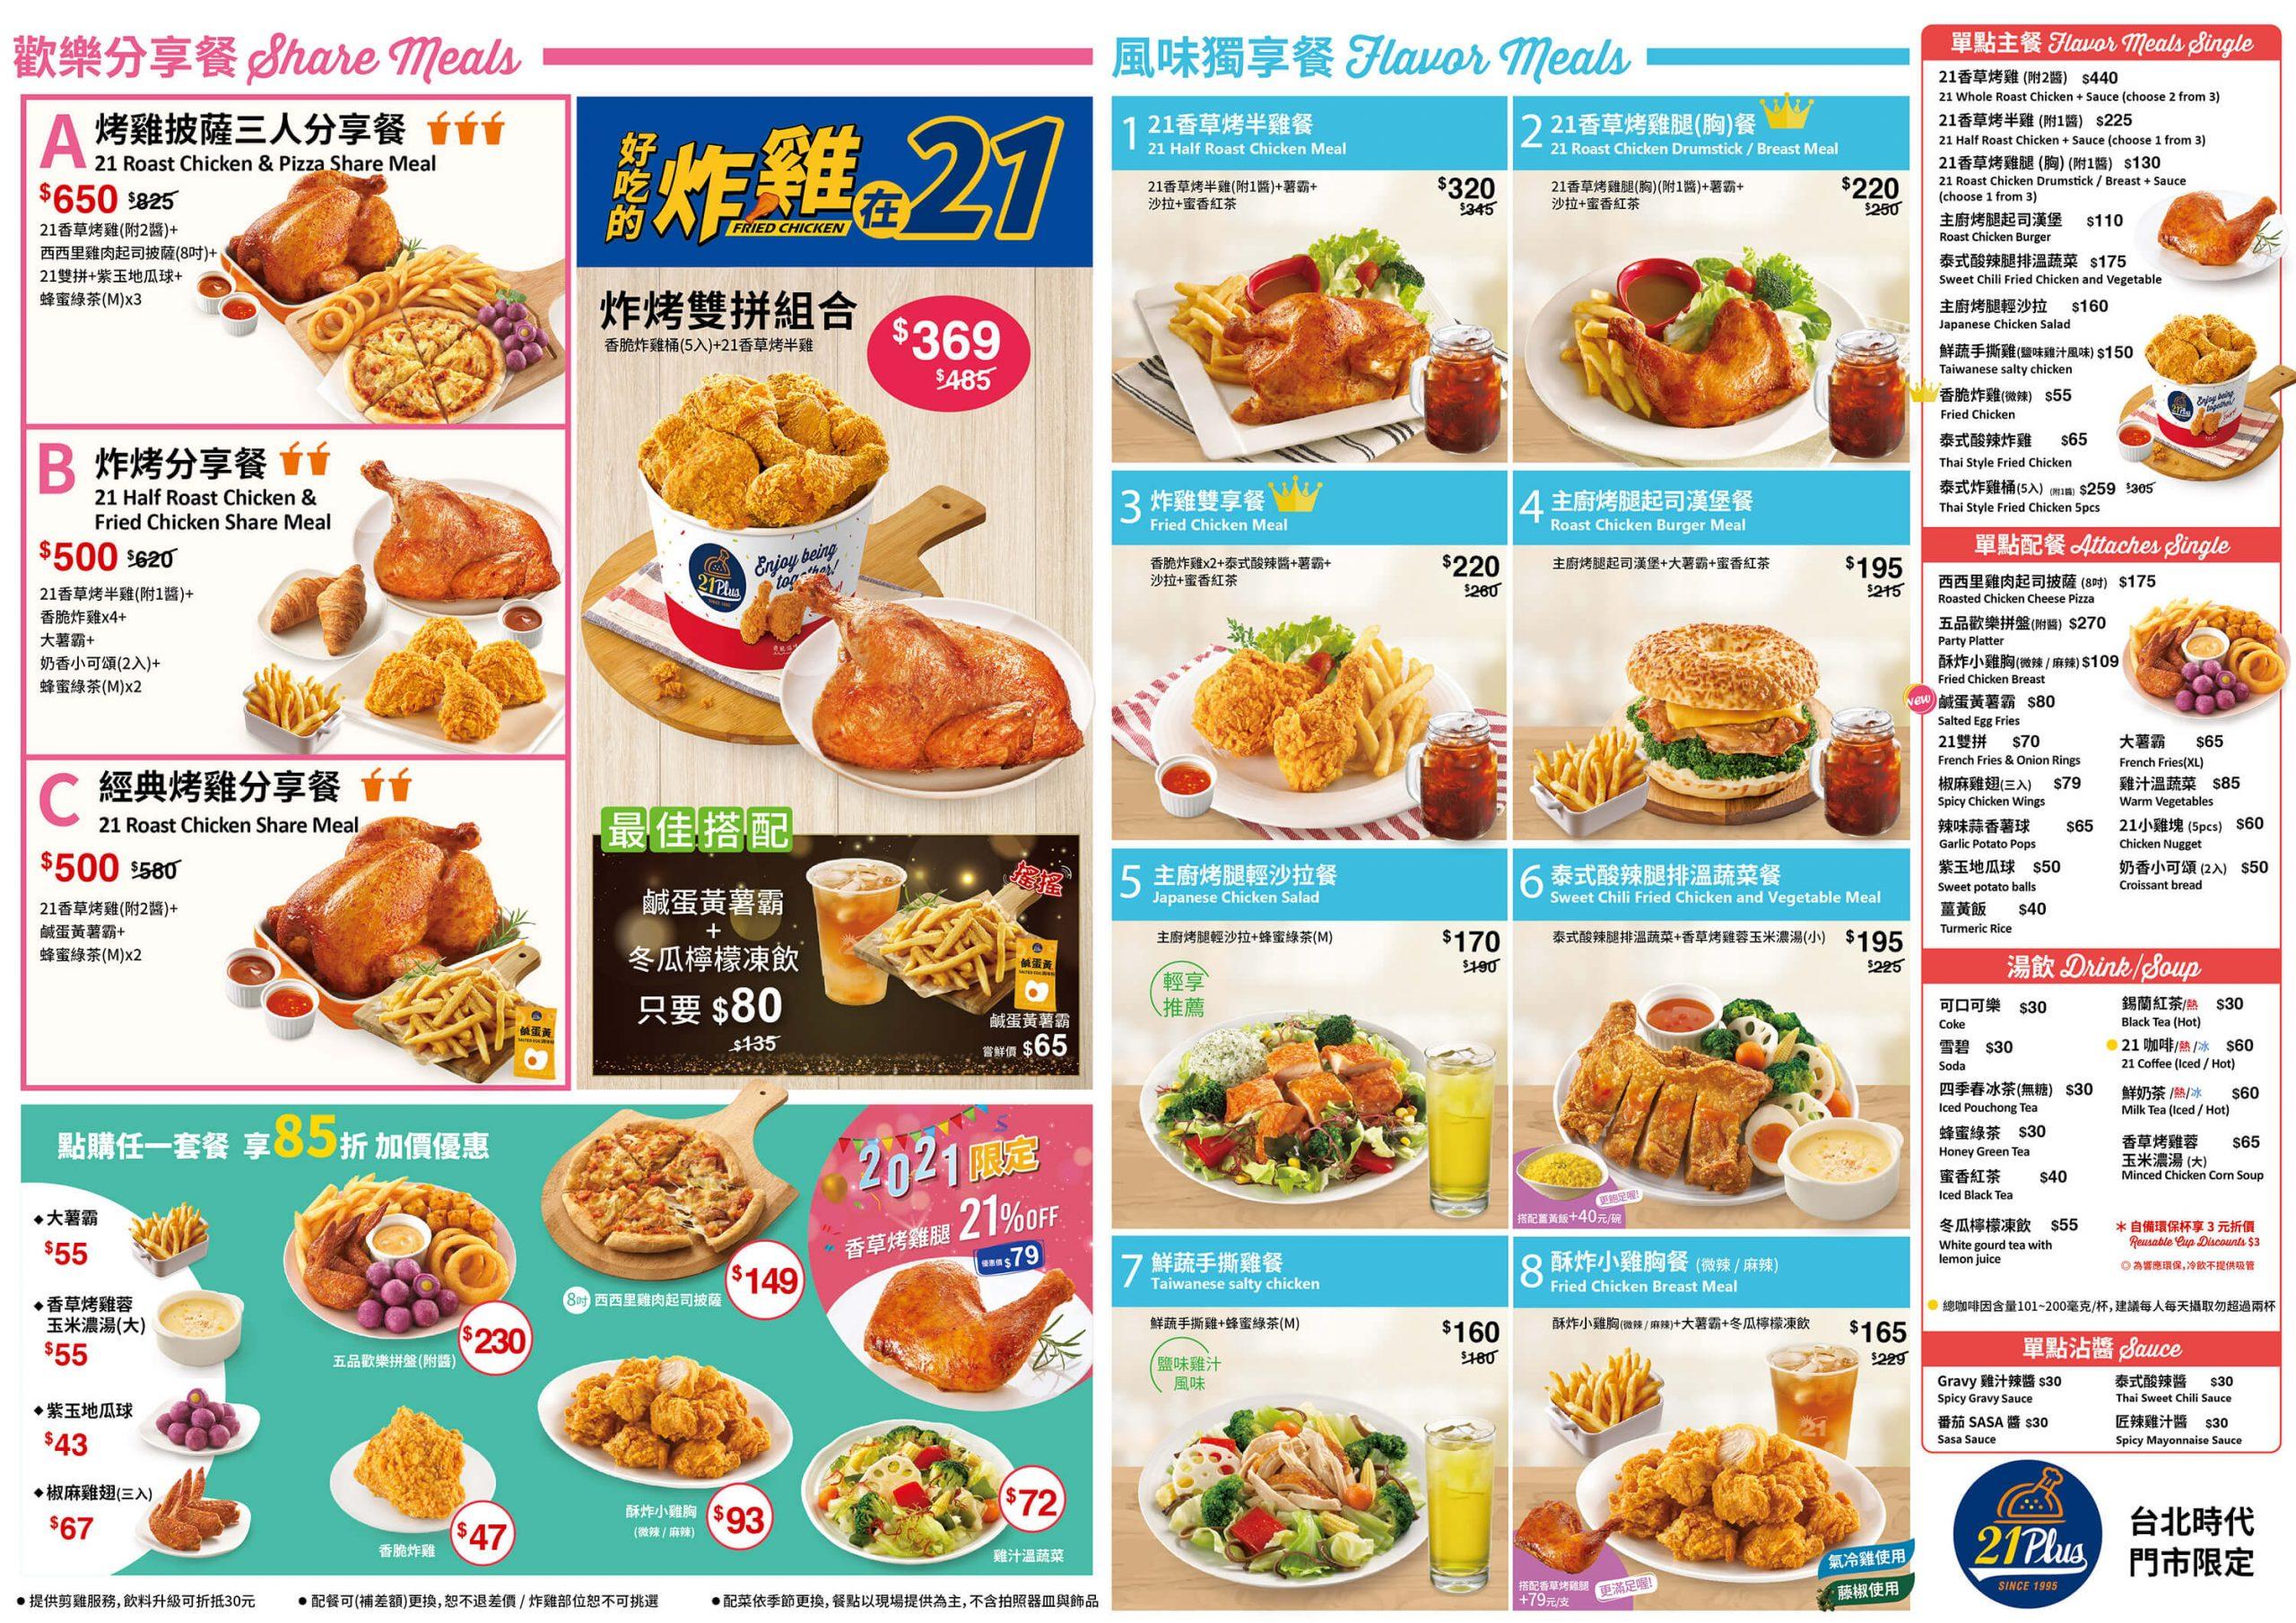 21PLUS台北時代限定菜單MENU